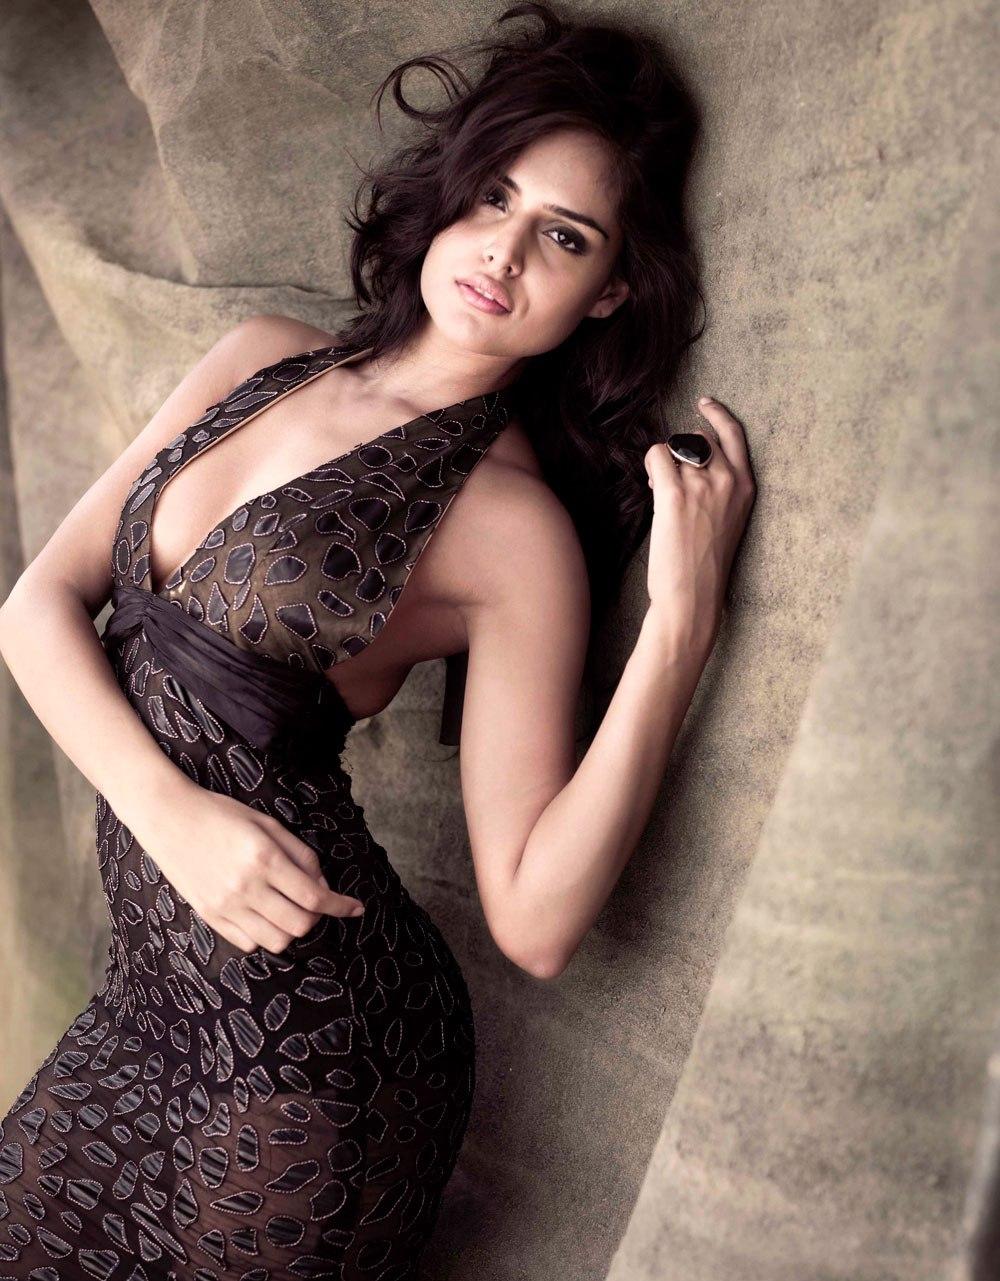 Nathalia Hot